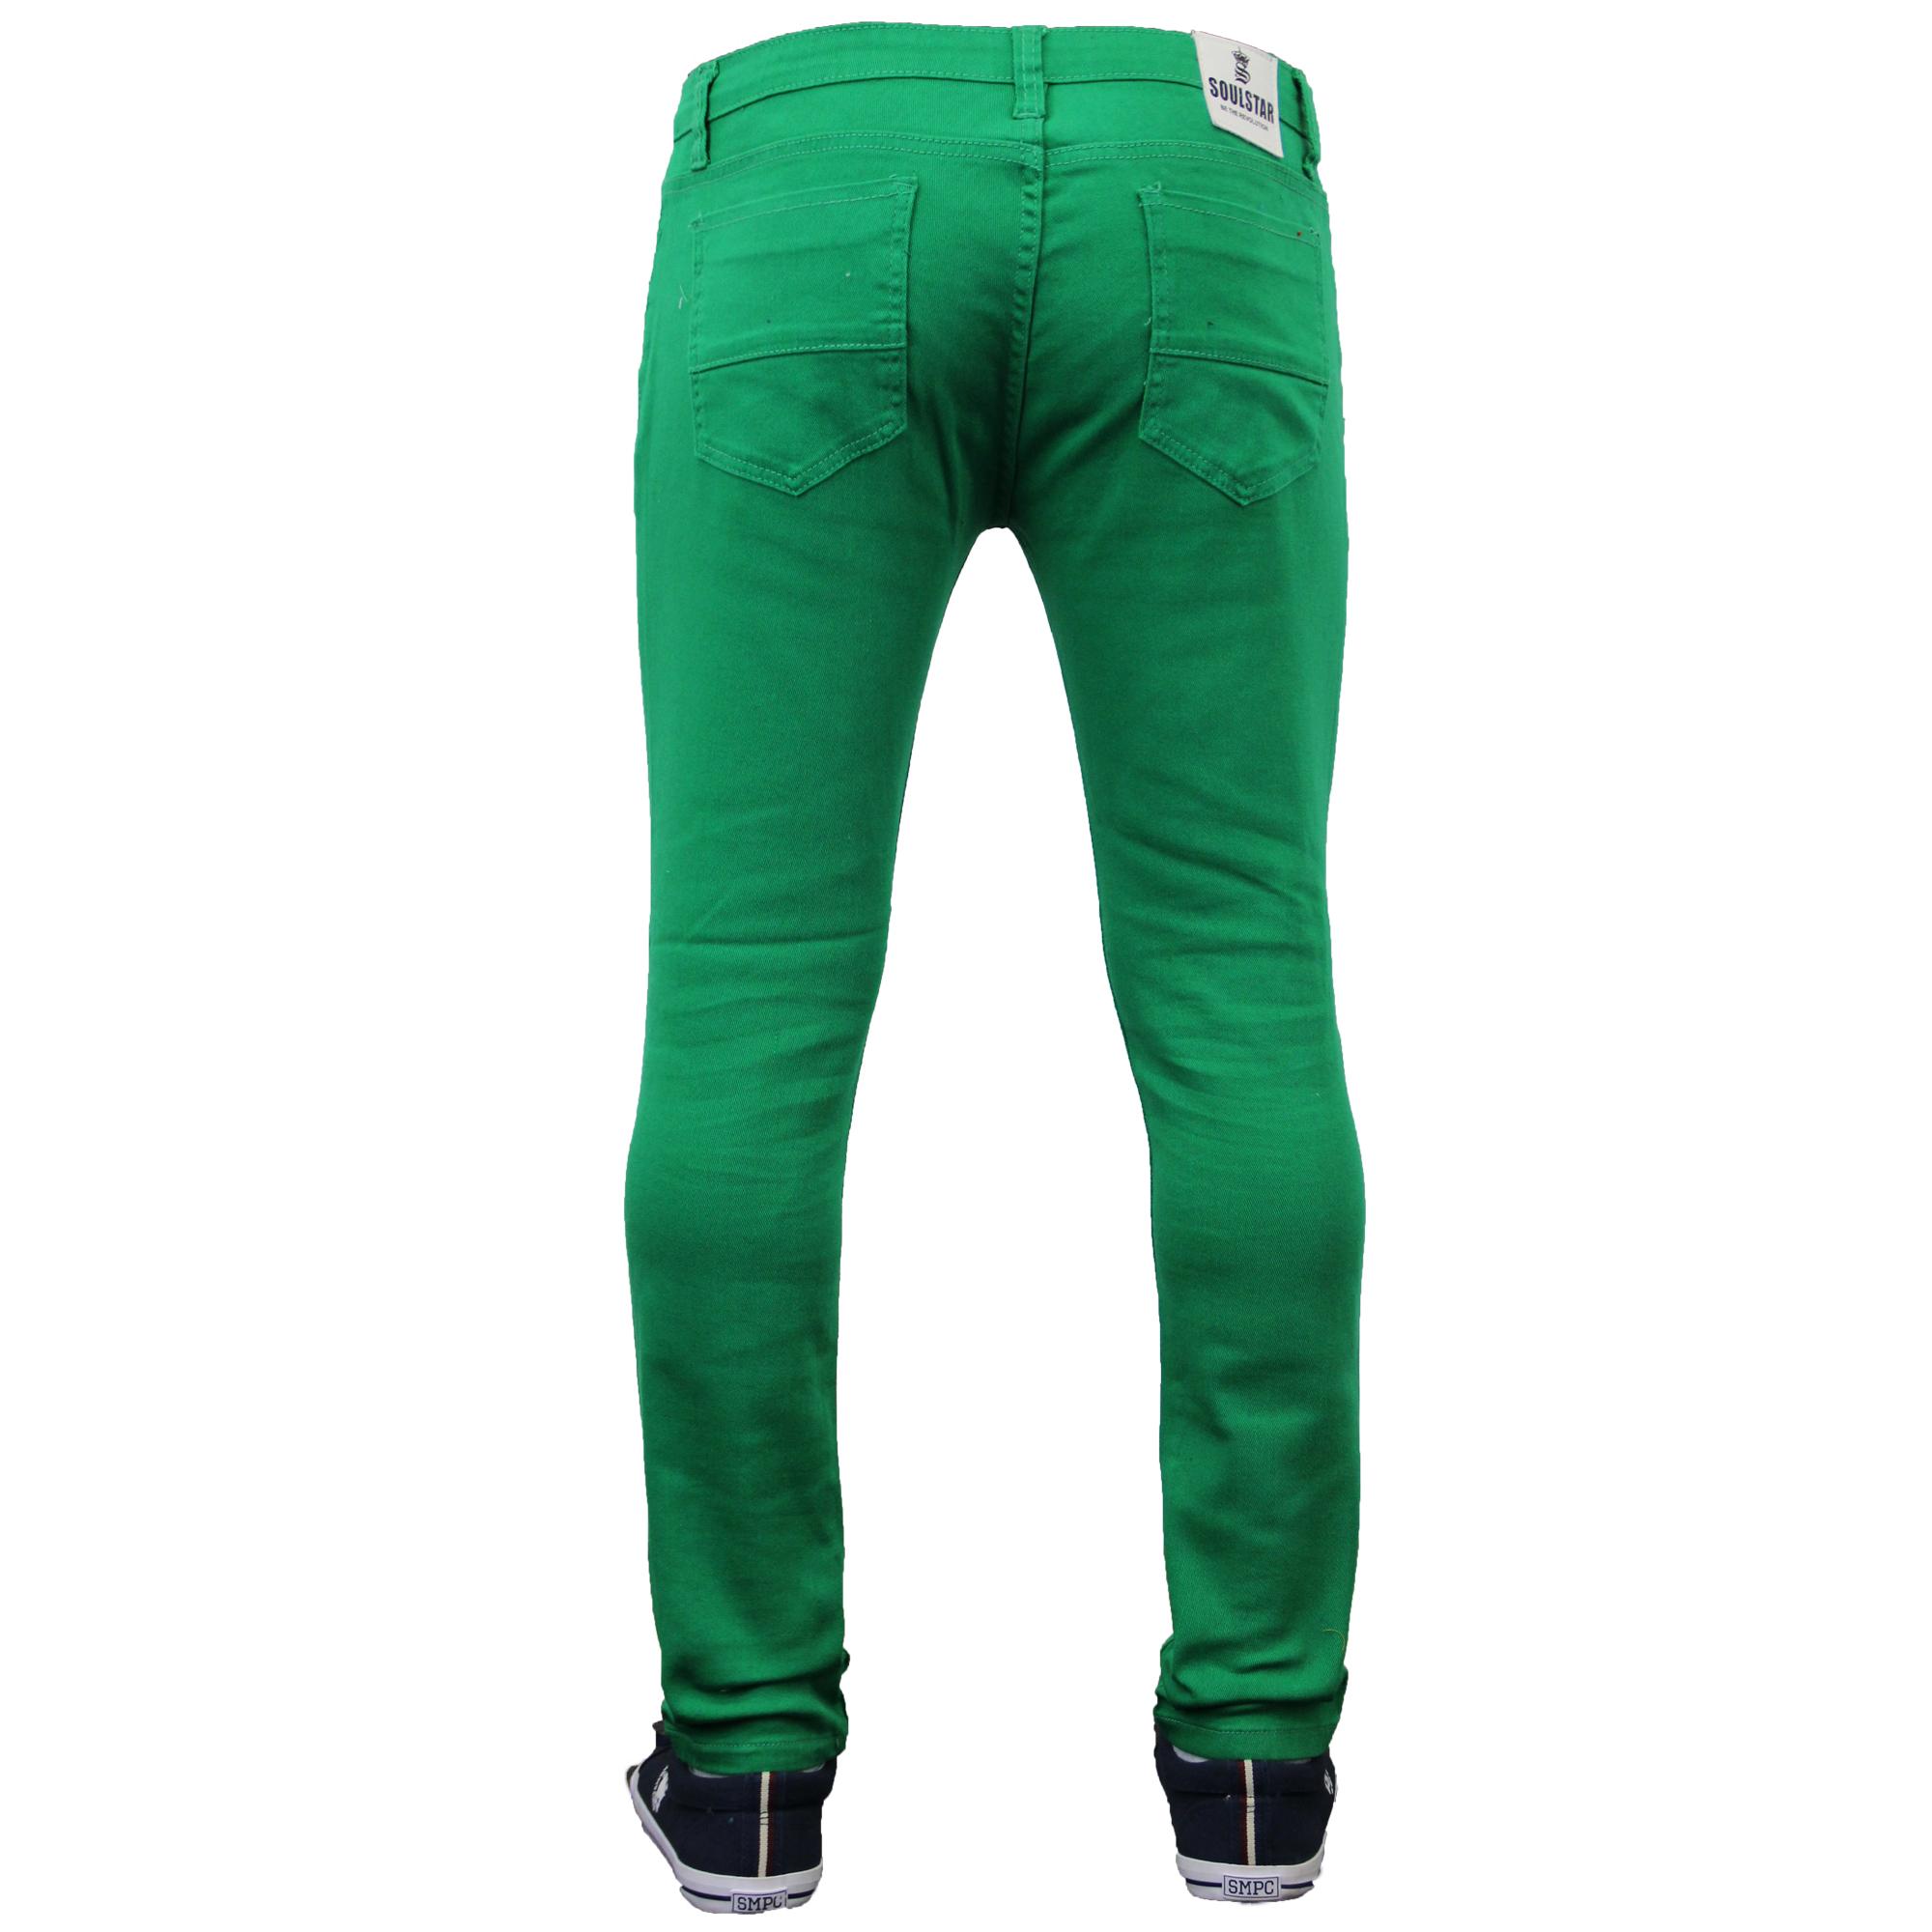 32aadf2c Mens Skinny Jeans Soul Star Slim Fit Stretch Denim Pants Trousers ...